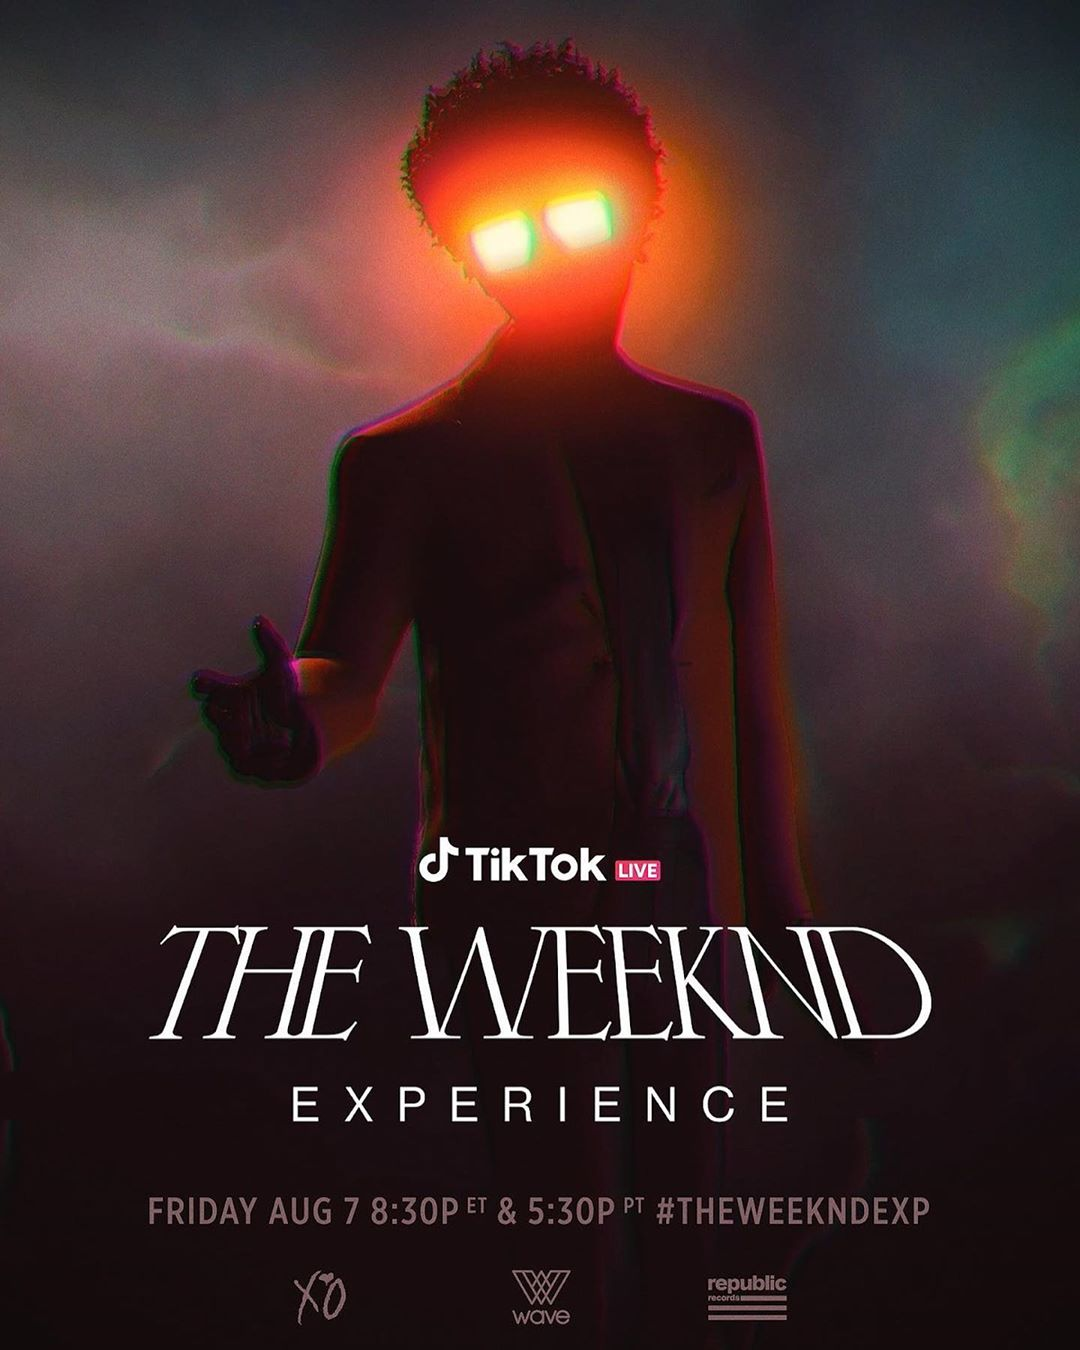 116707606 745430519565163 139748374258088056 n 1 - Watch The Weeknd's 360-degree Tiktok Virtual Reality Video